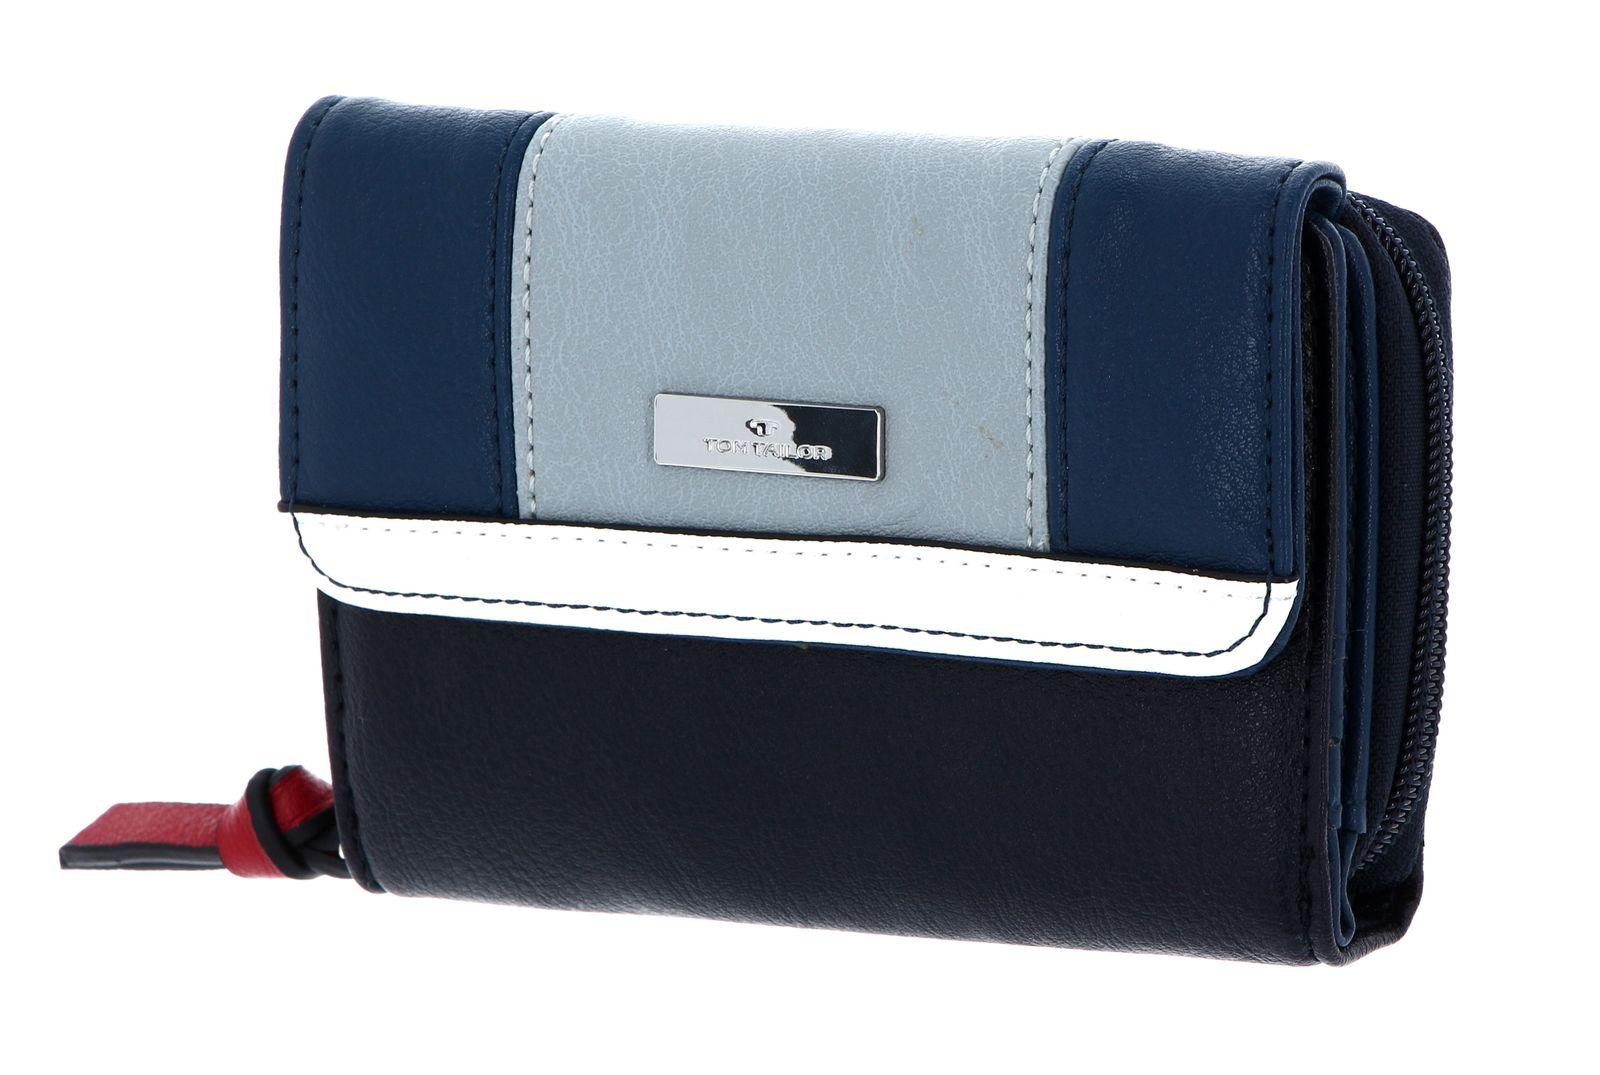 TOM TAILOR Juna Medium Flap Wallet Geldbörse Mixed Maritim Blau Weiß Neu